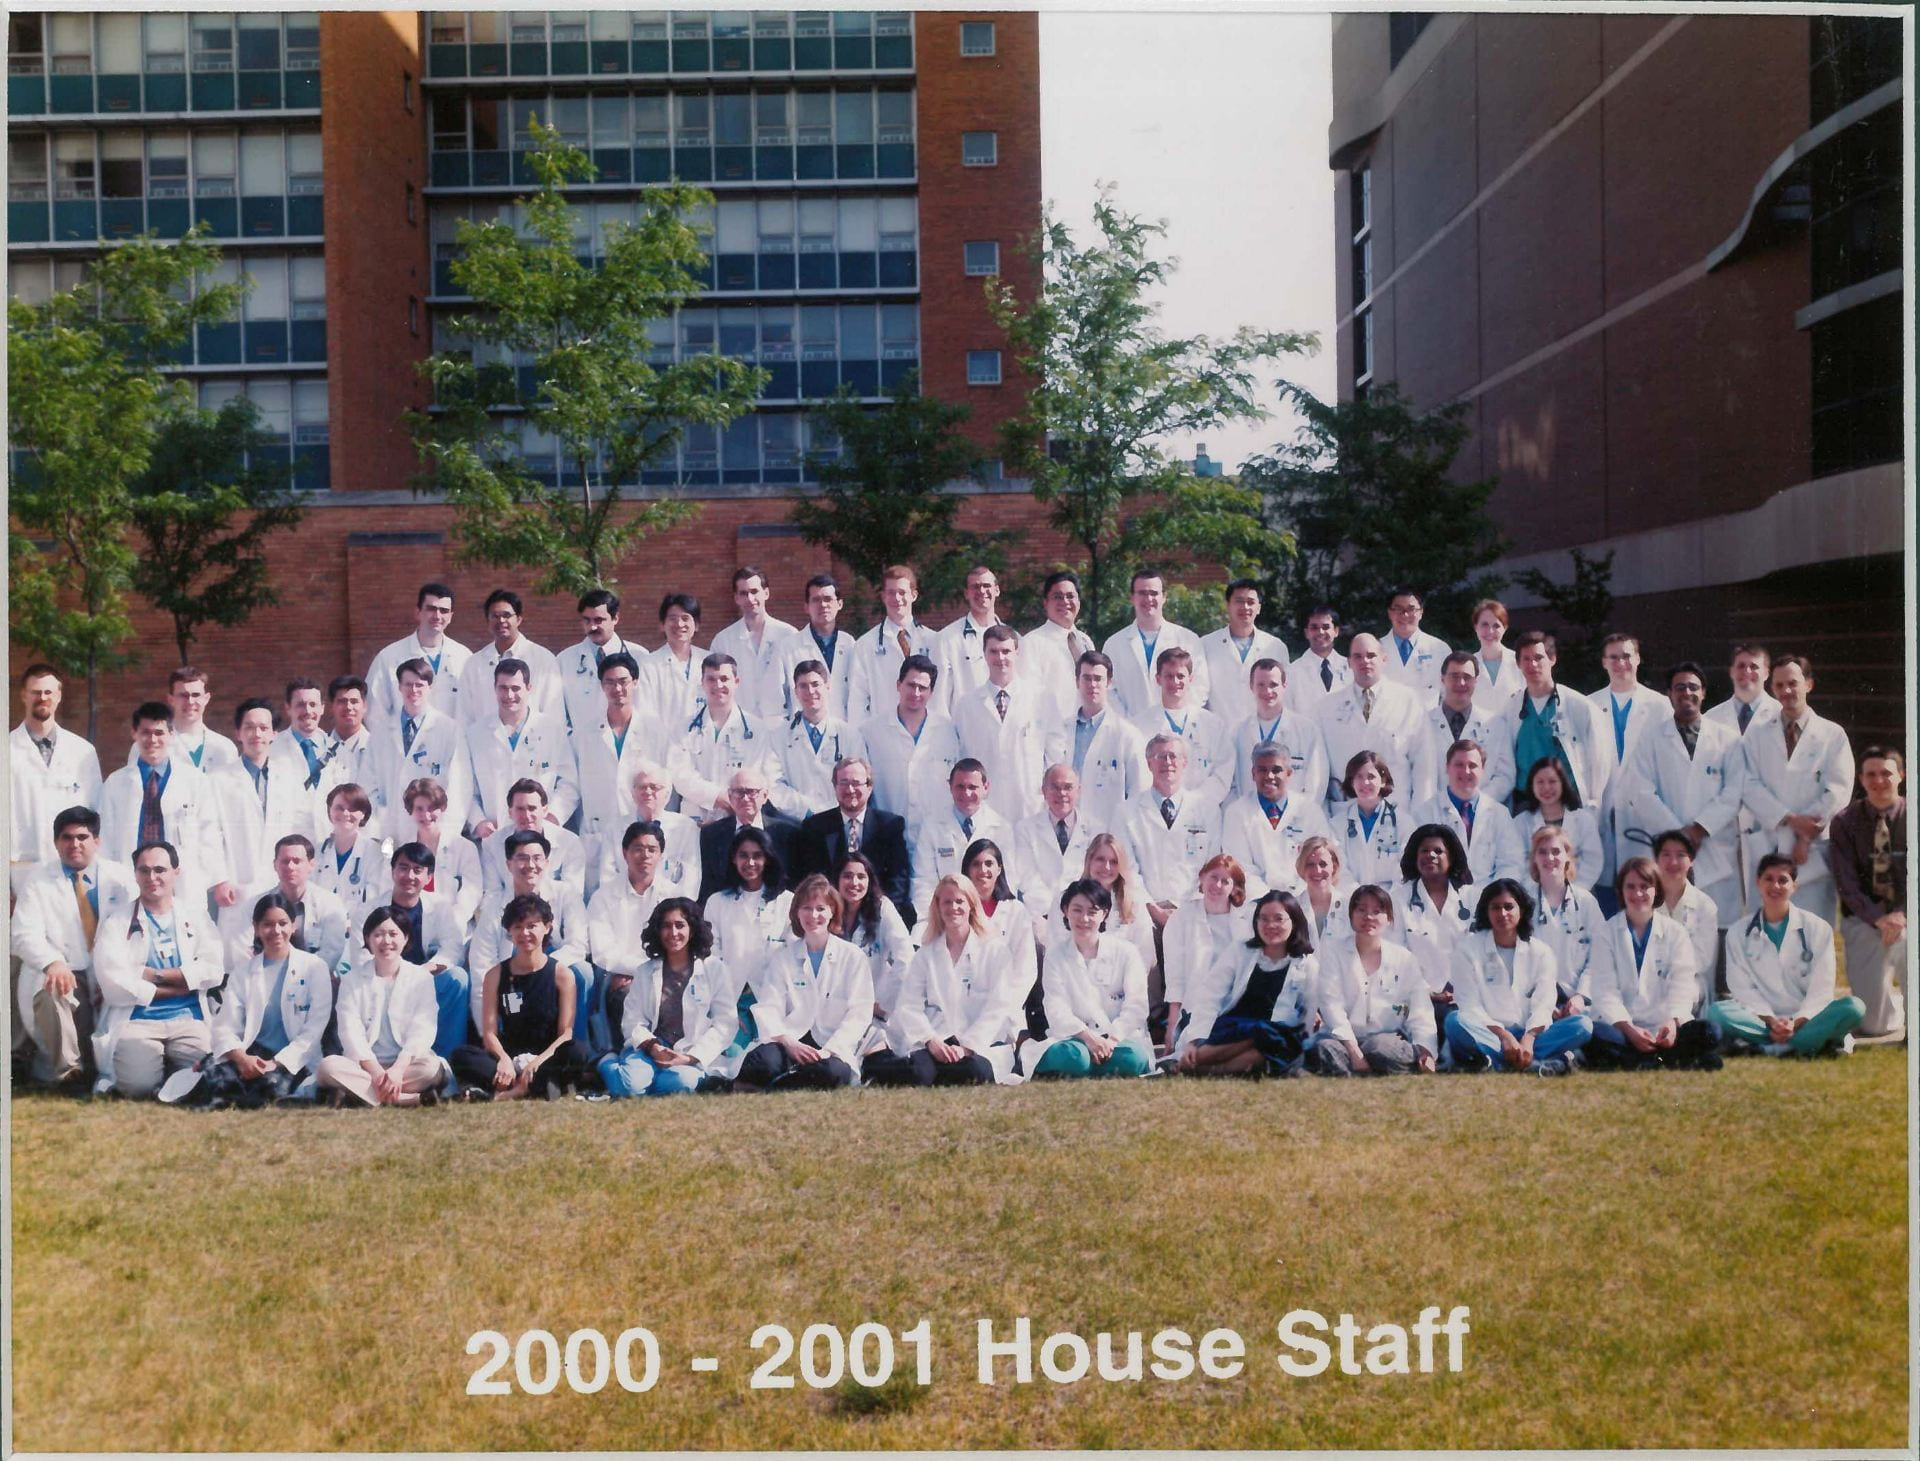 2000 Housestaff Photo